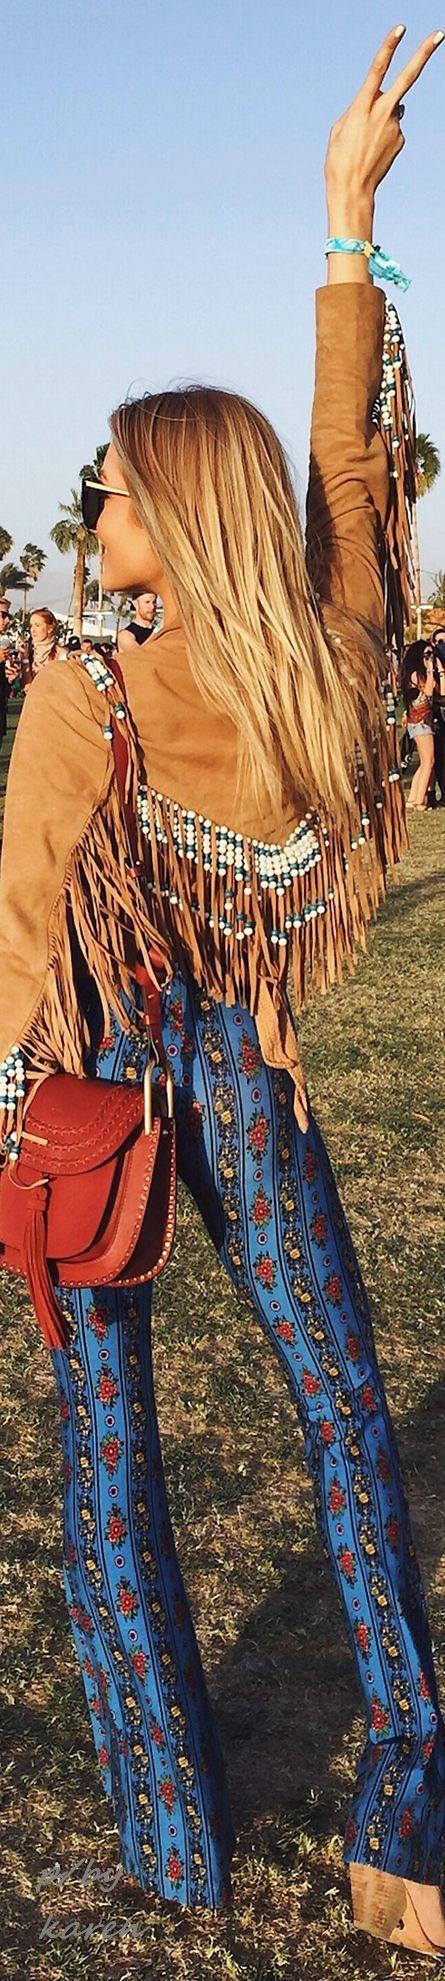 Boho Festival Style ~ FROM COACHELLA 2016 ≫∙∙☮️ Bohème Babe ☮️∙∙≪• ❤️ Curated by Babz™️ ✿ιиѕριяαтισи❀ #abbigliamento #bohojewelry #boho